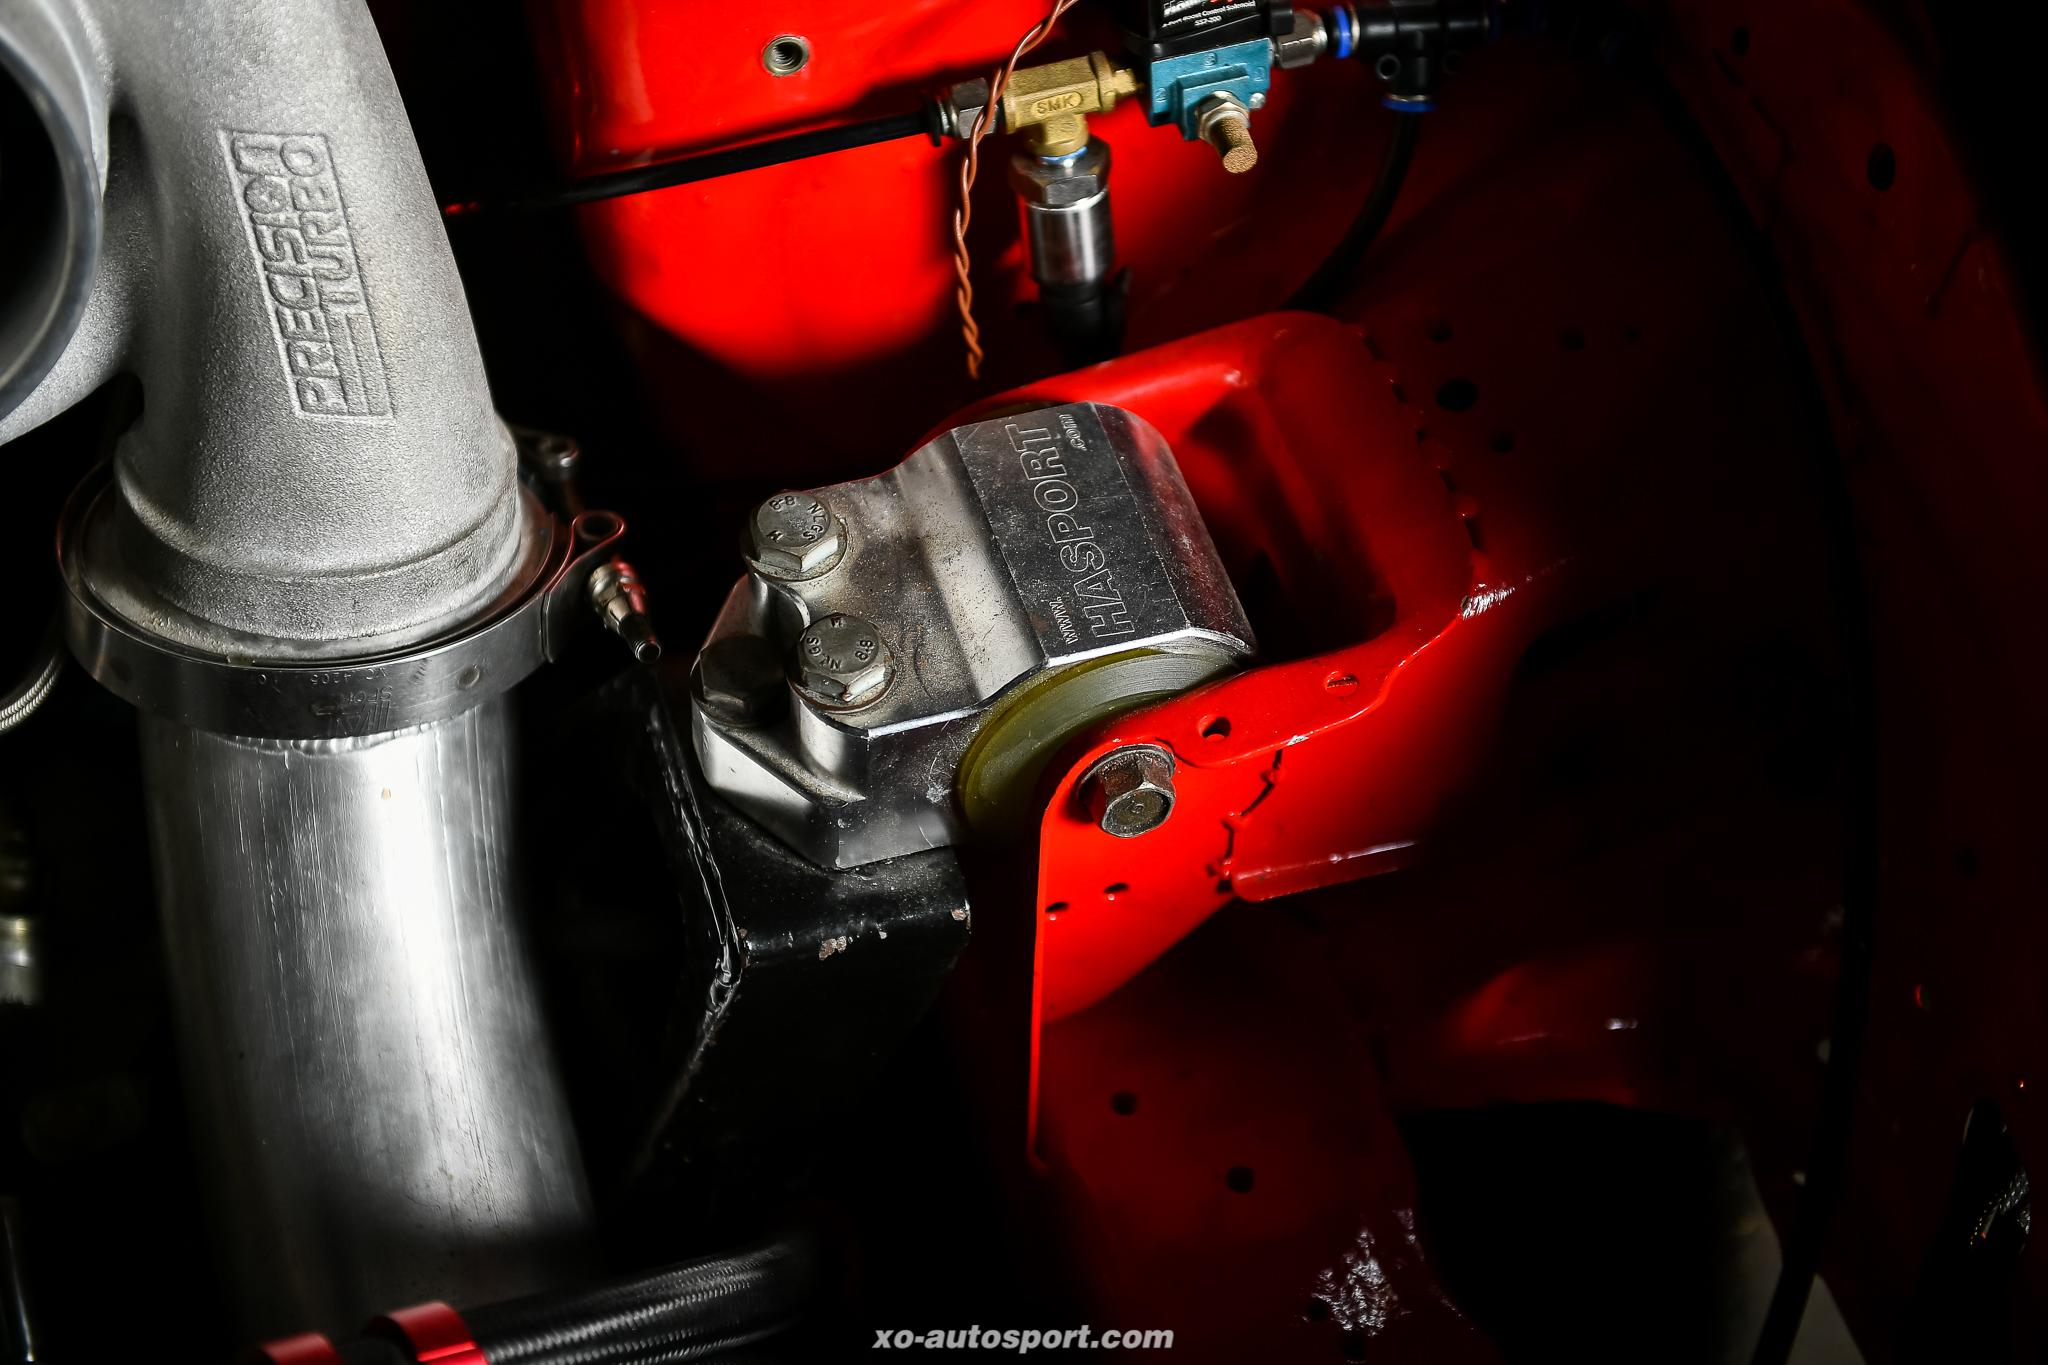 INTEGRA DC2 PRO 4 FWD Champion by FLOW LAB CNC 32